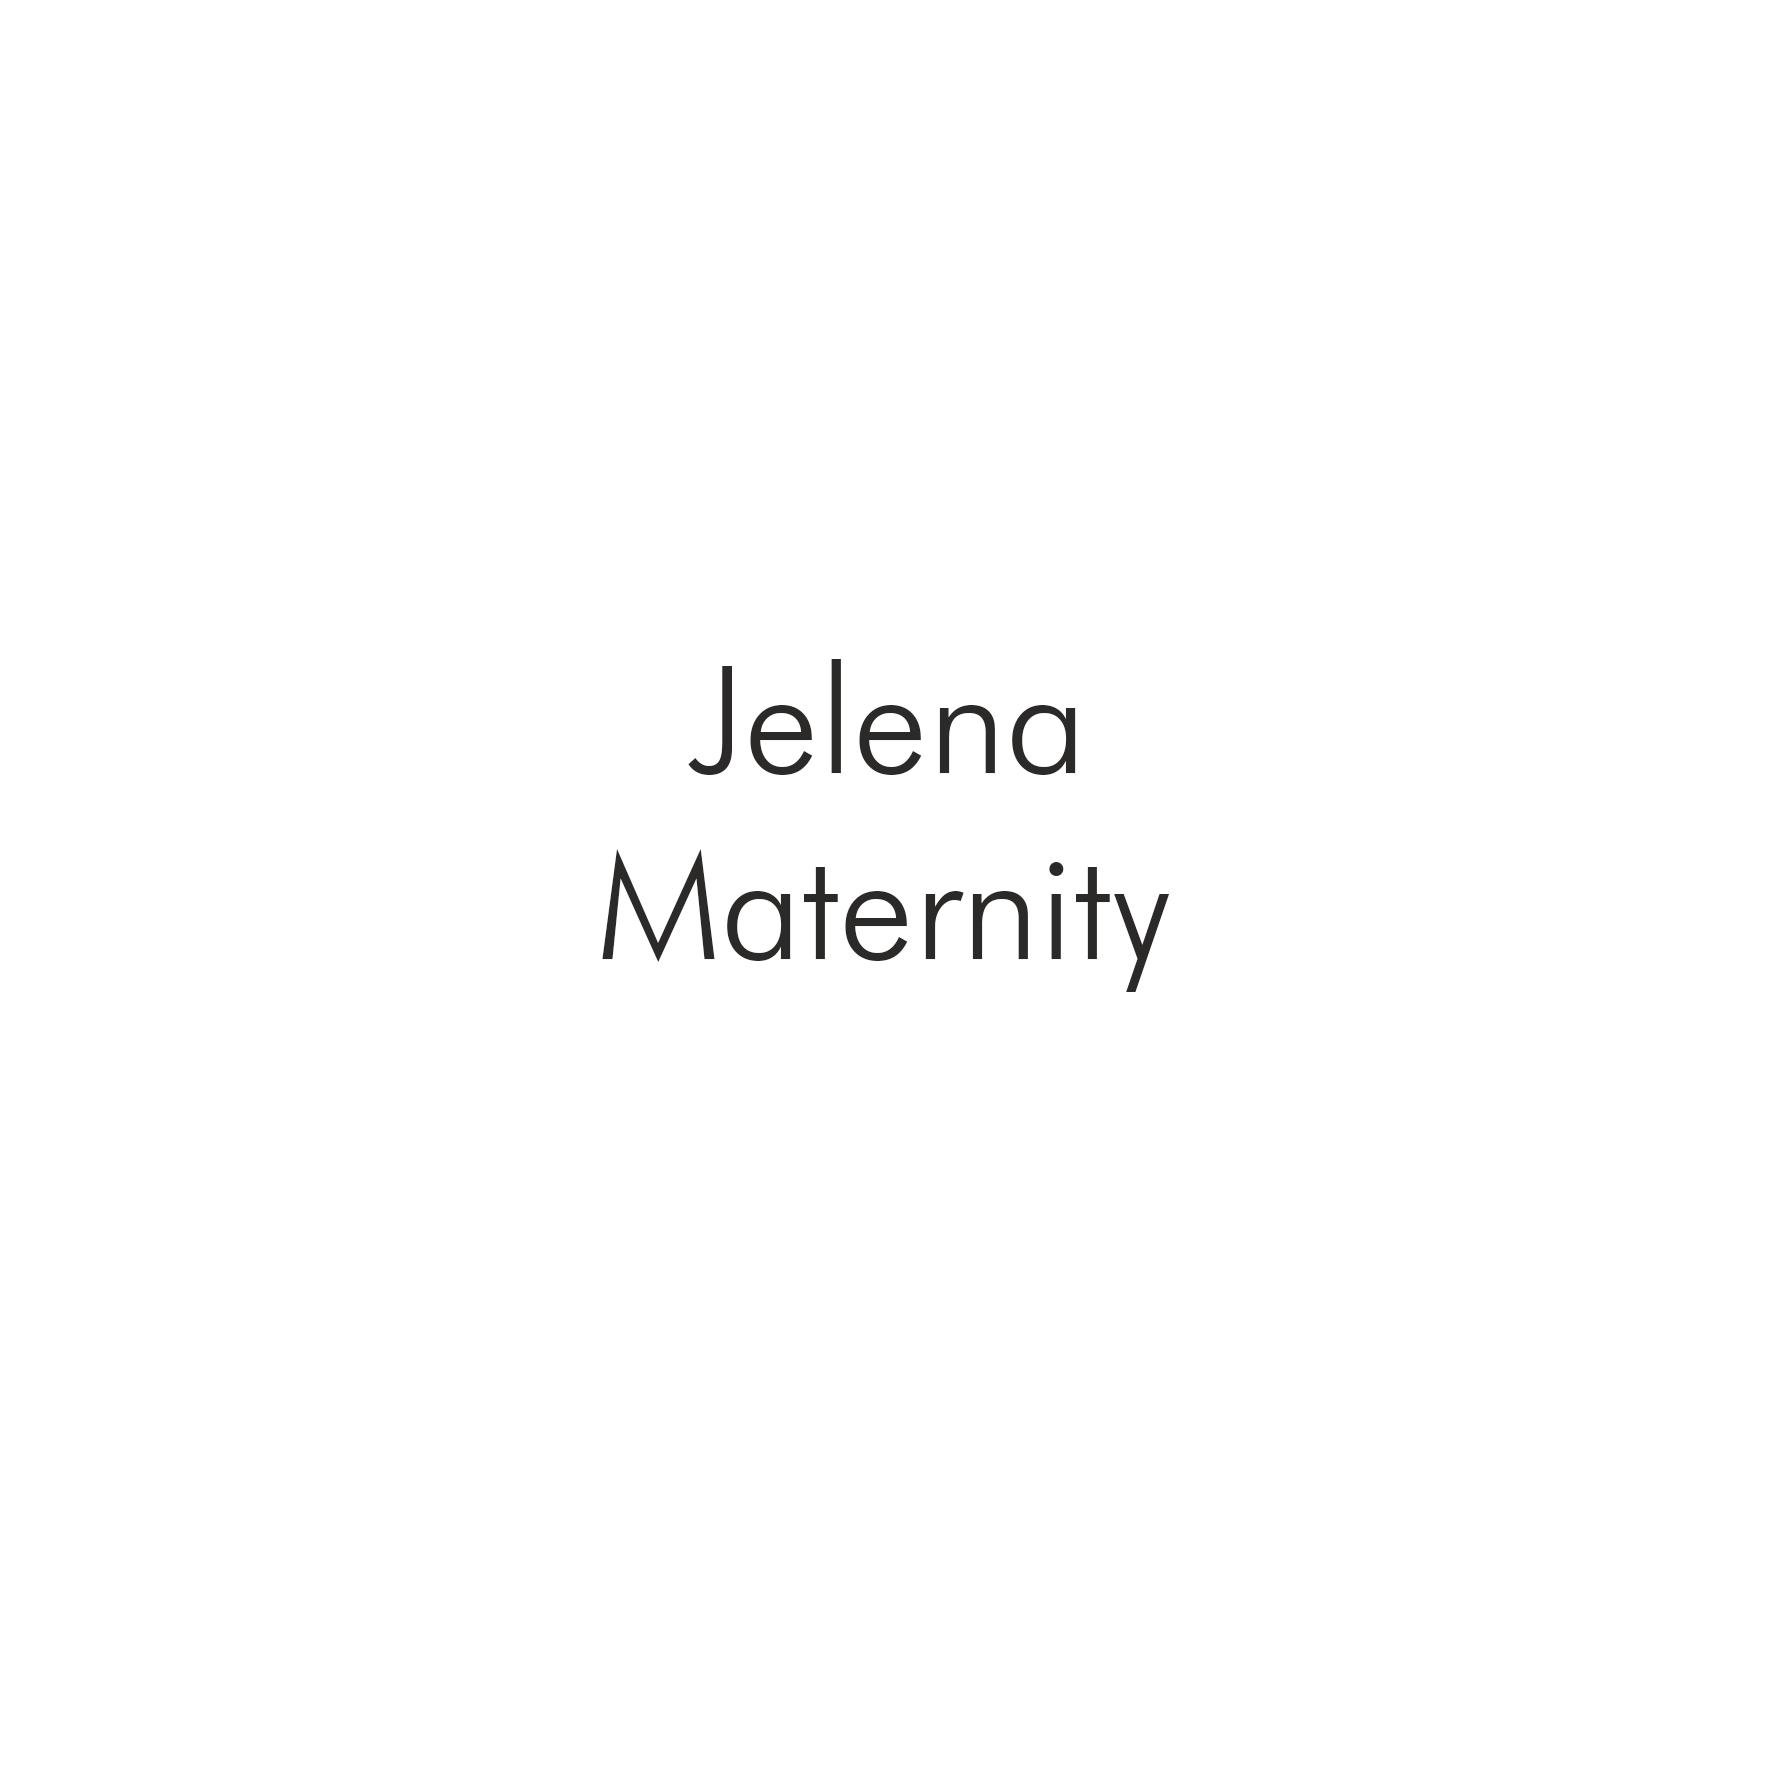 Jelena Maternity.png